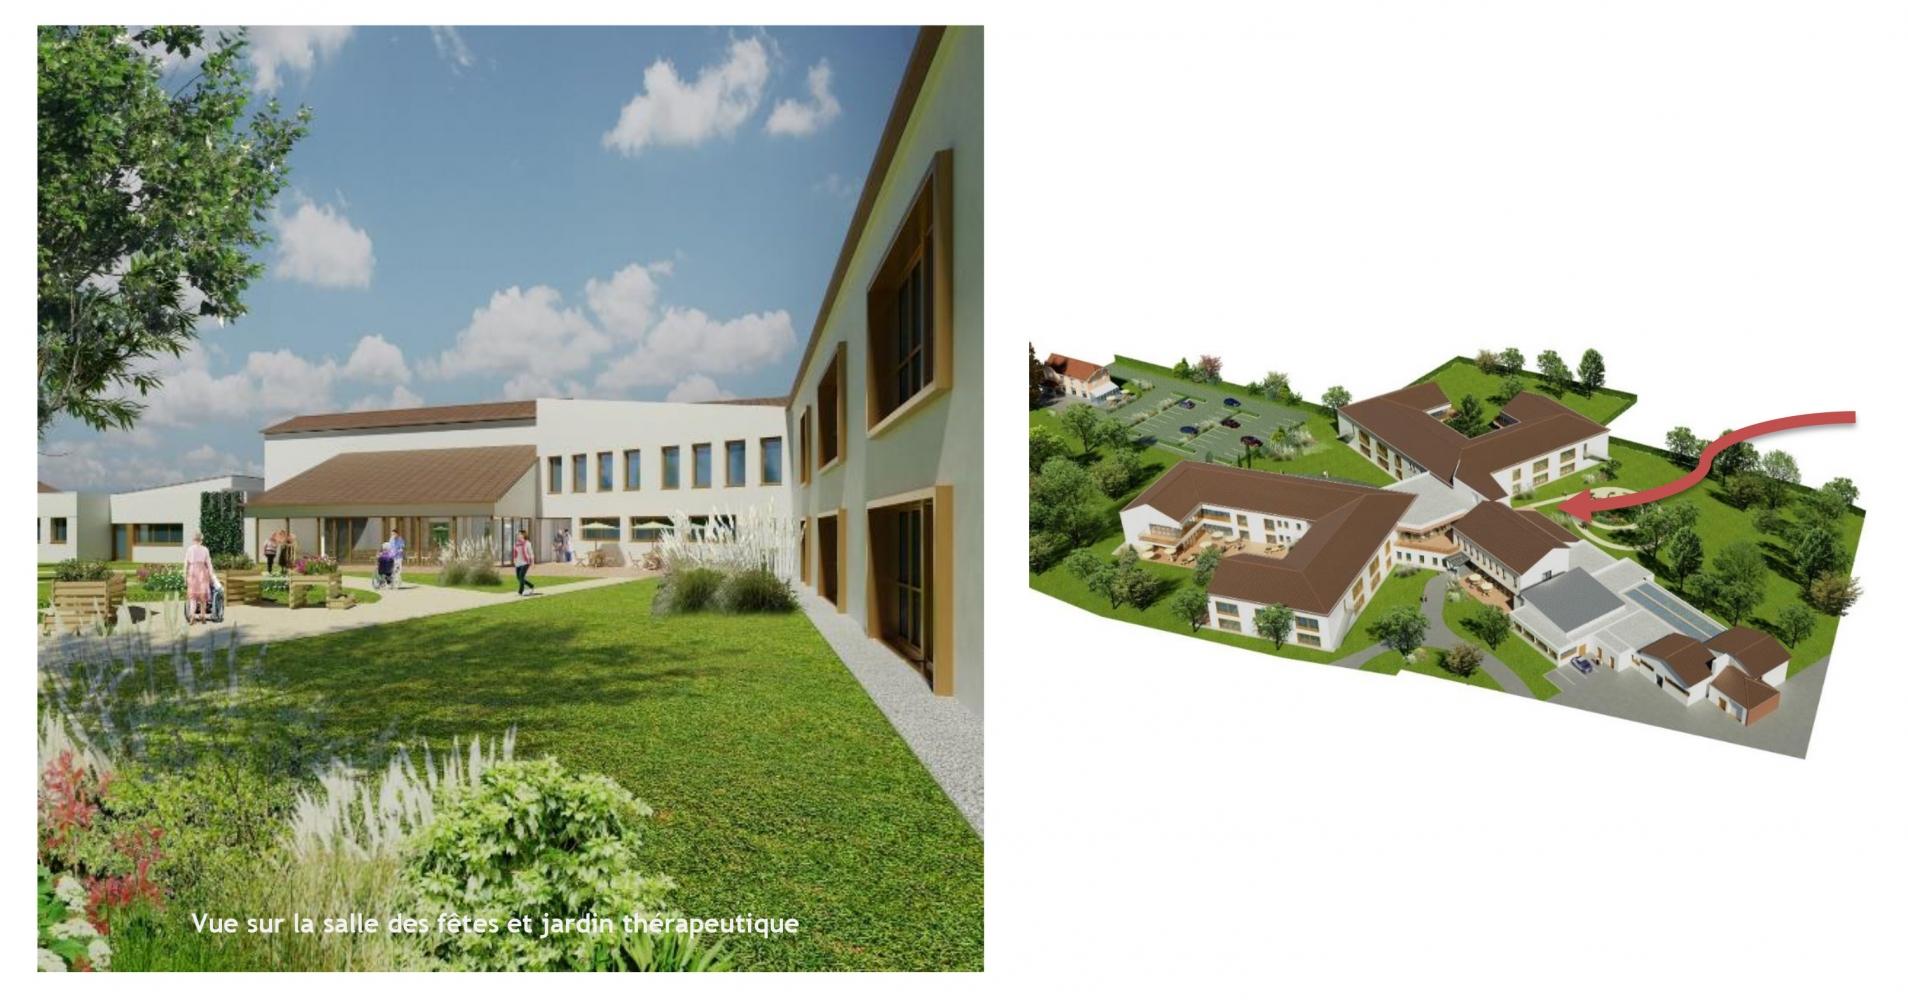 01-st-germain-img-006 Pascale SEURIN Architecte - Médico-Social